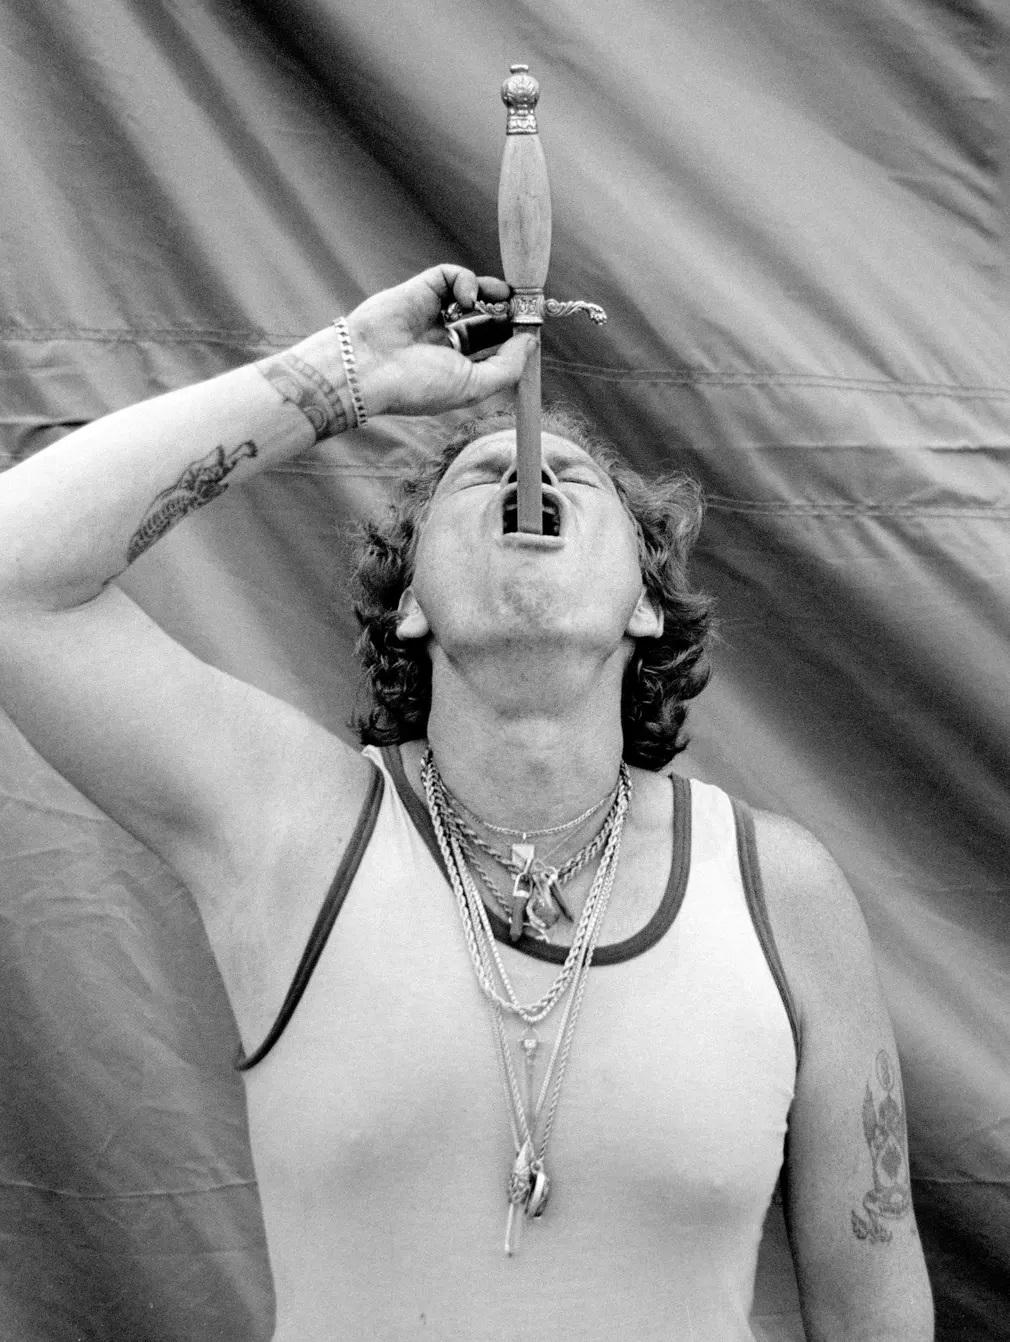 Kardnyelo Cirkusz Mutatvanyos Clayton Anderson Nap Fotoja